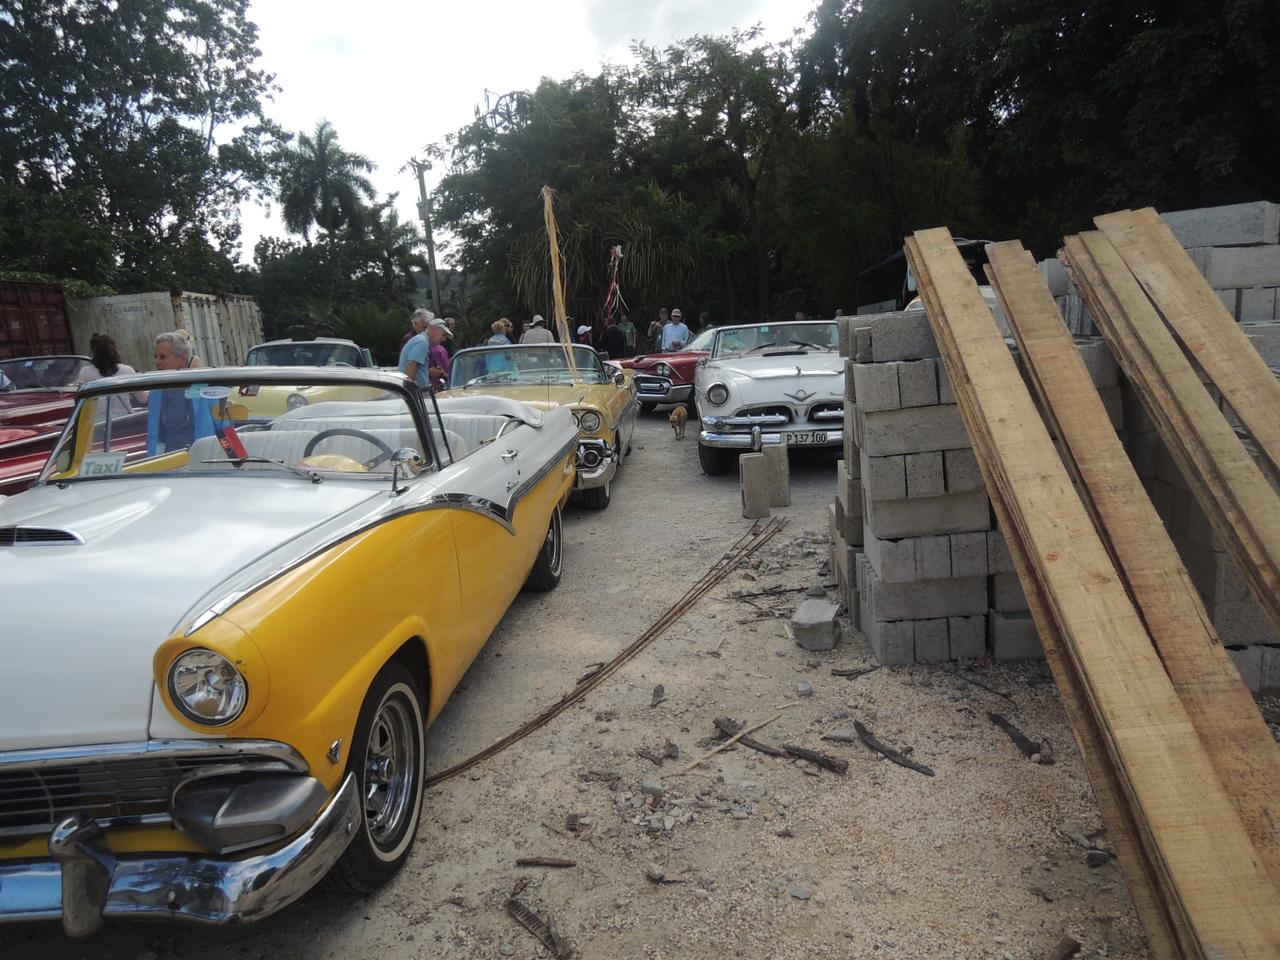 More convertibles.  A 55 Ford, a 58 Chevy, a 56 DeSoto.